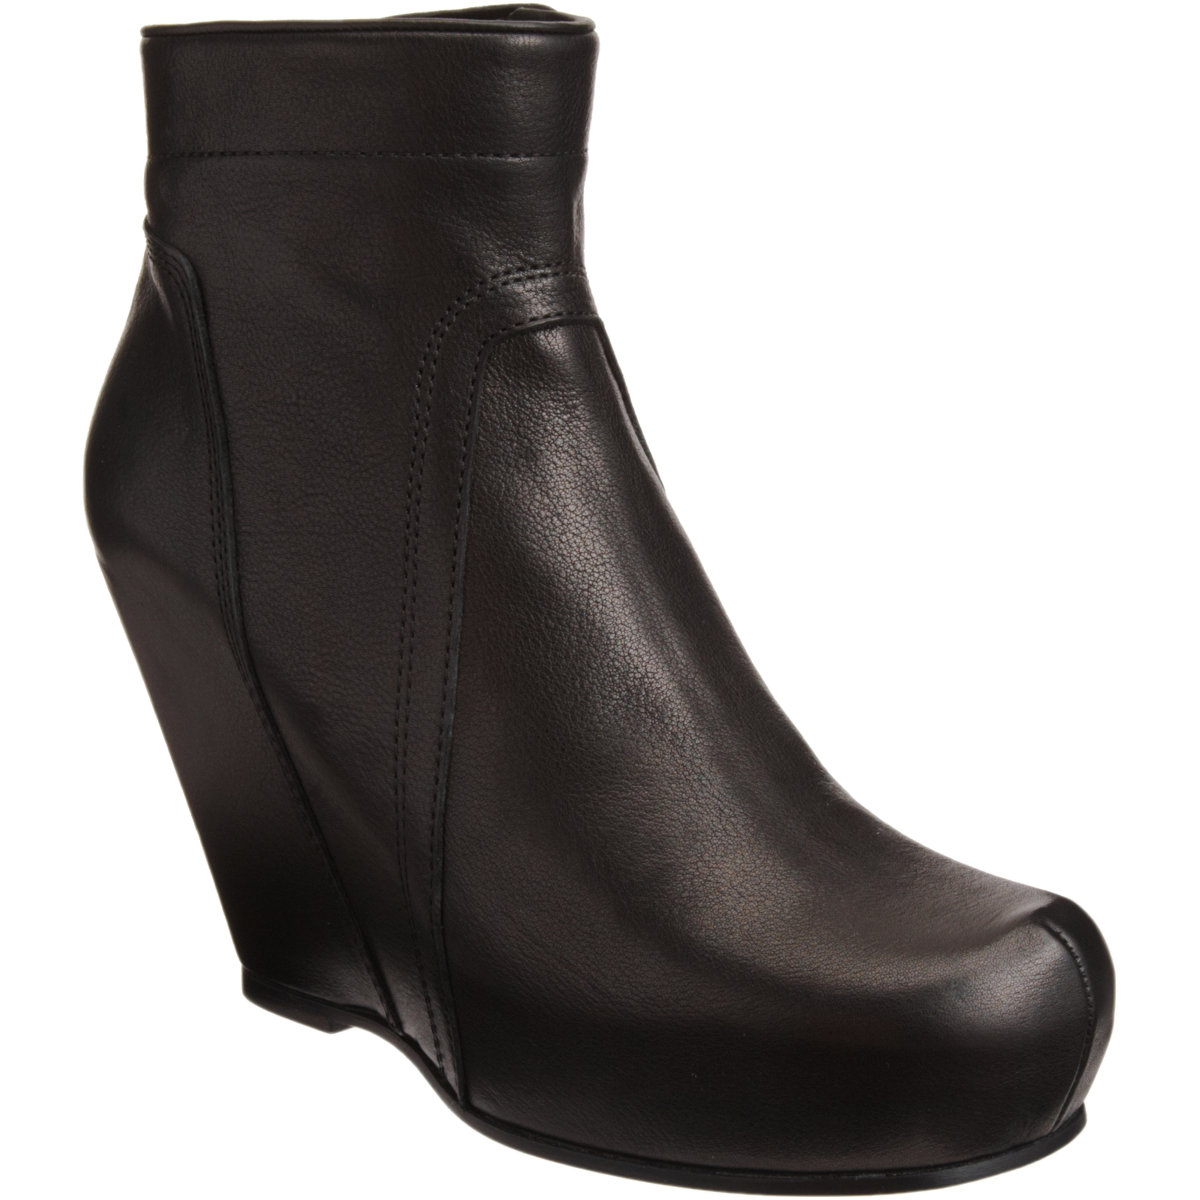 rick owens side zip wedge ankle boot in black silver lyst